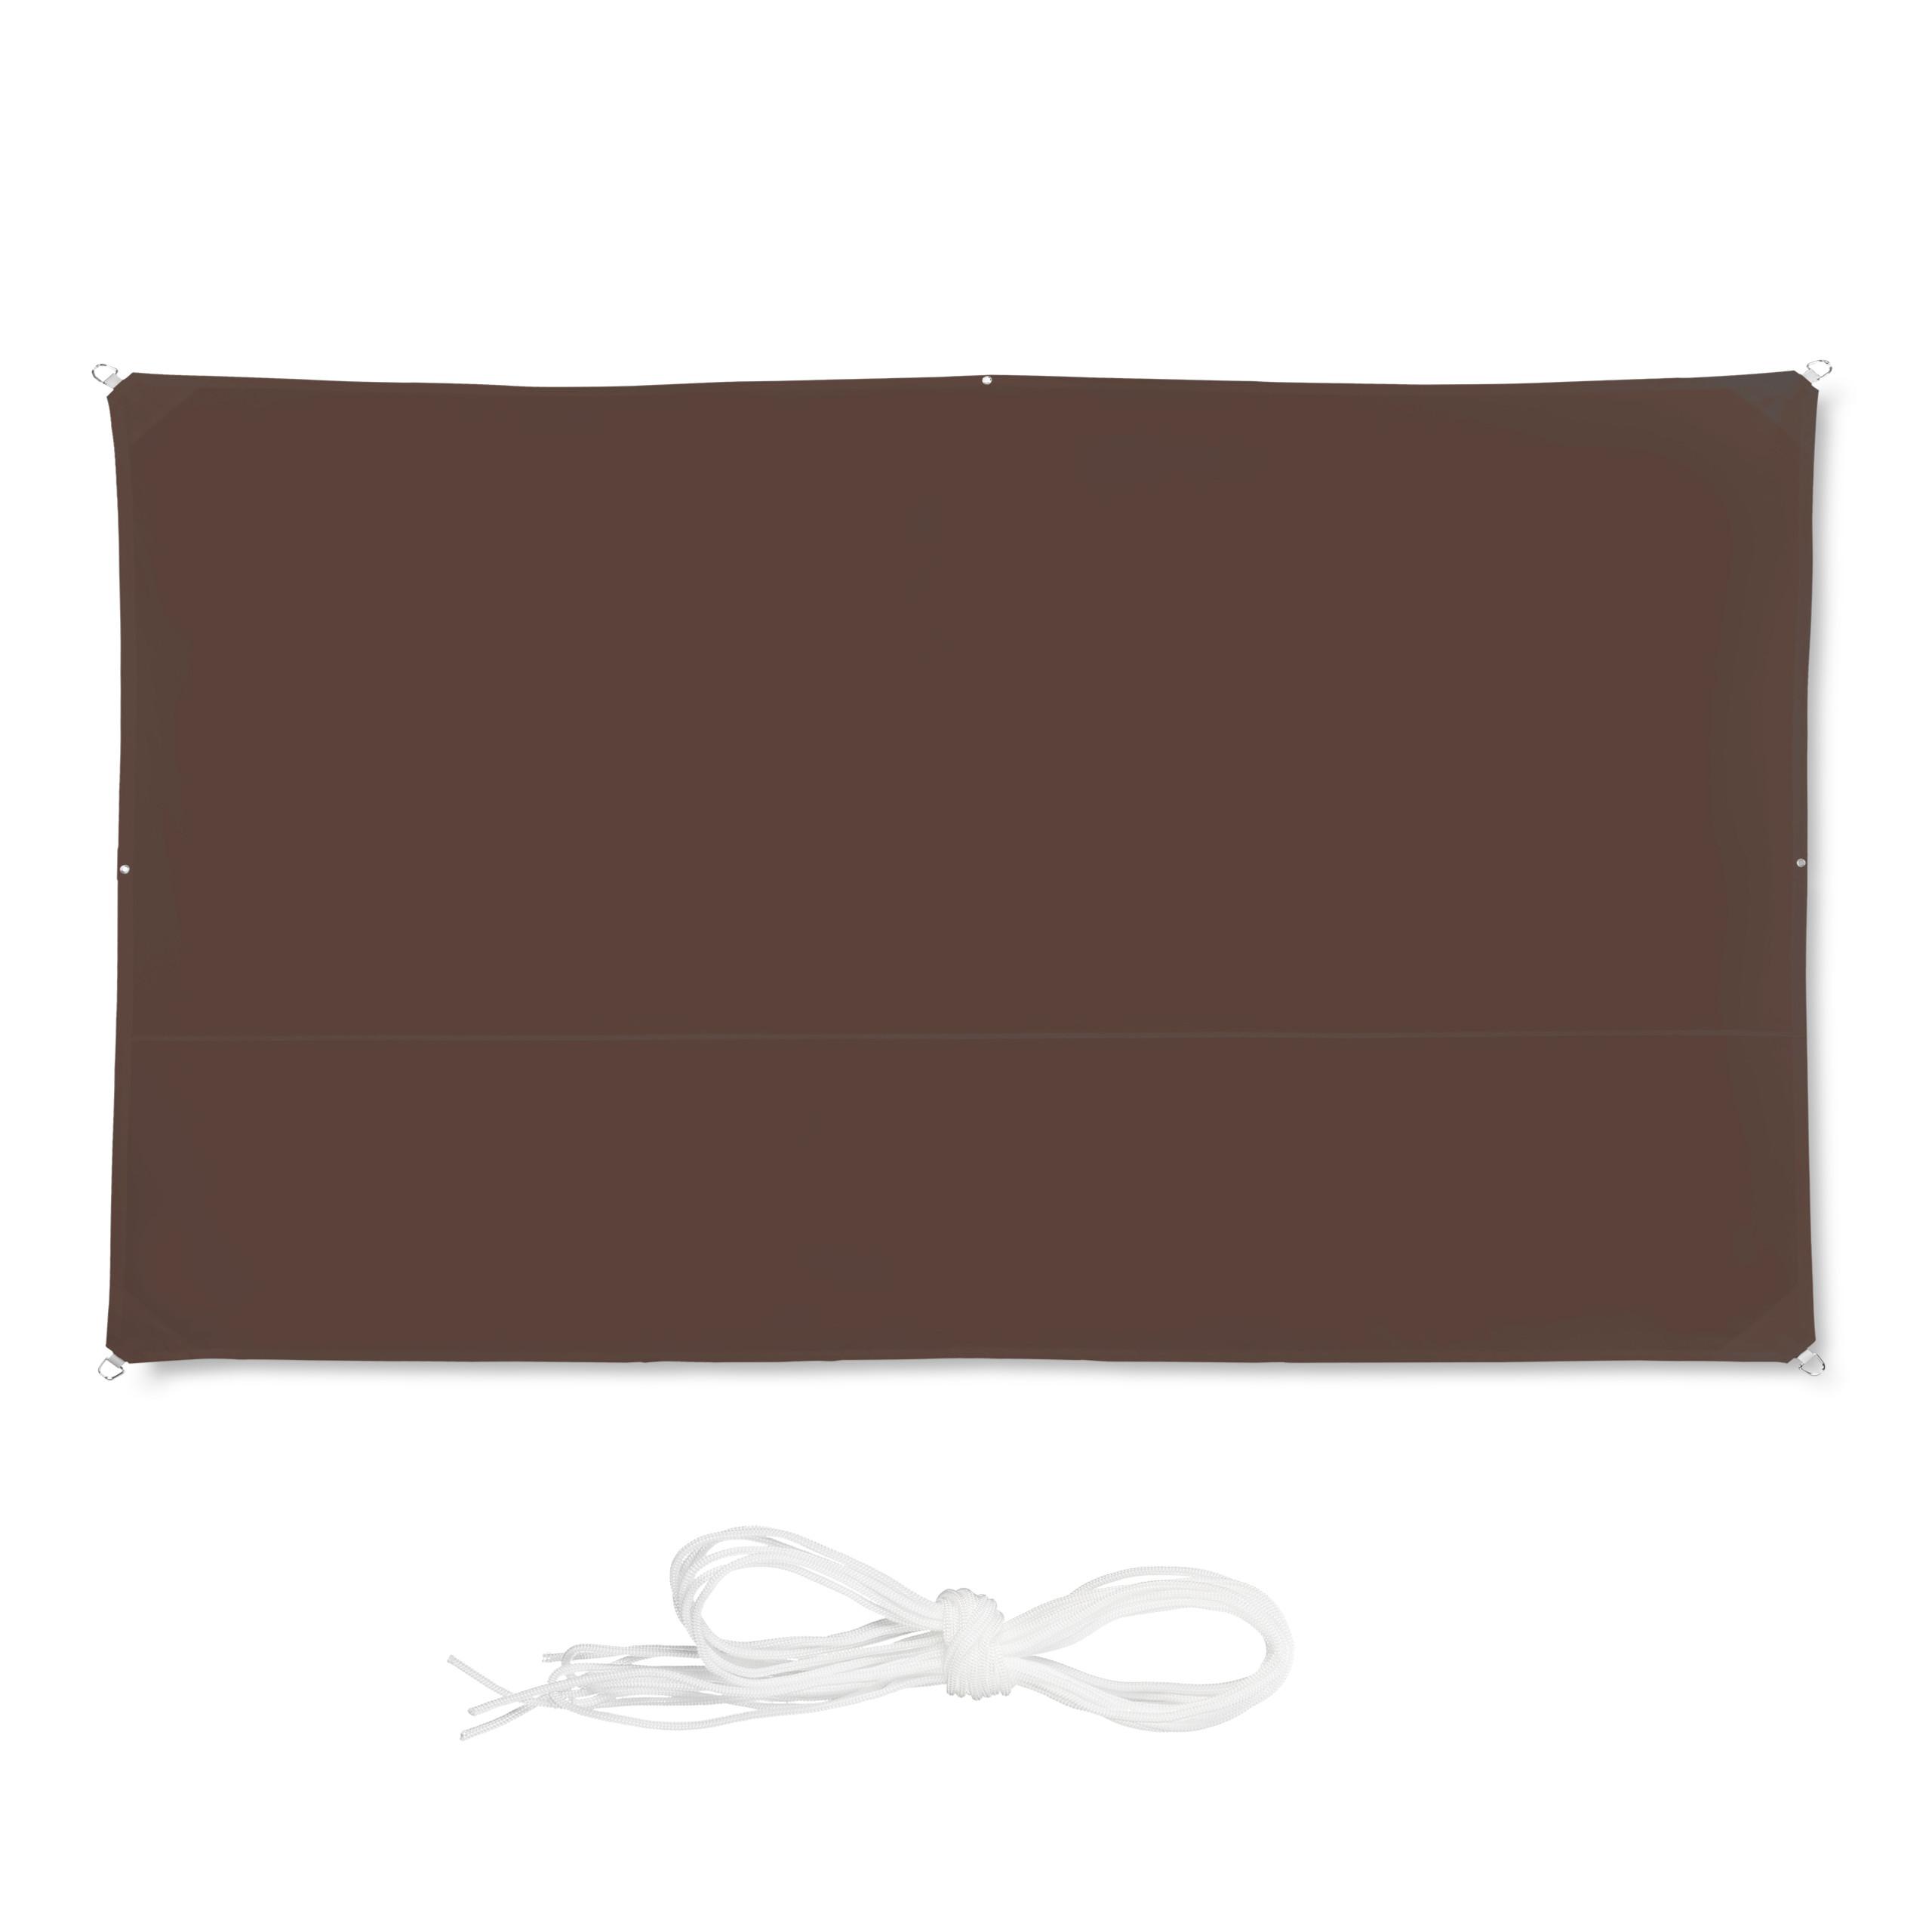 voile d ombrage rectangle ombre protection soleil balcon. Black Bedroom Furniture Sets. Home Design Ideas